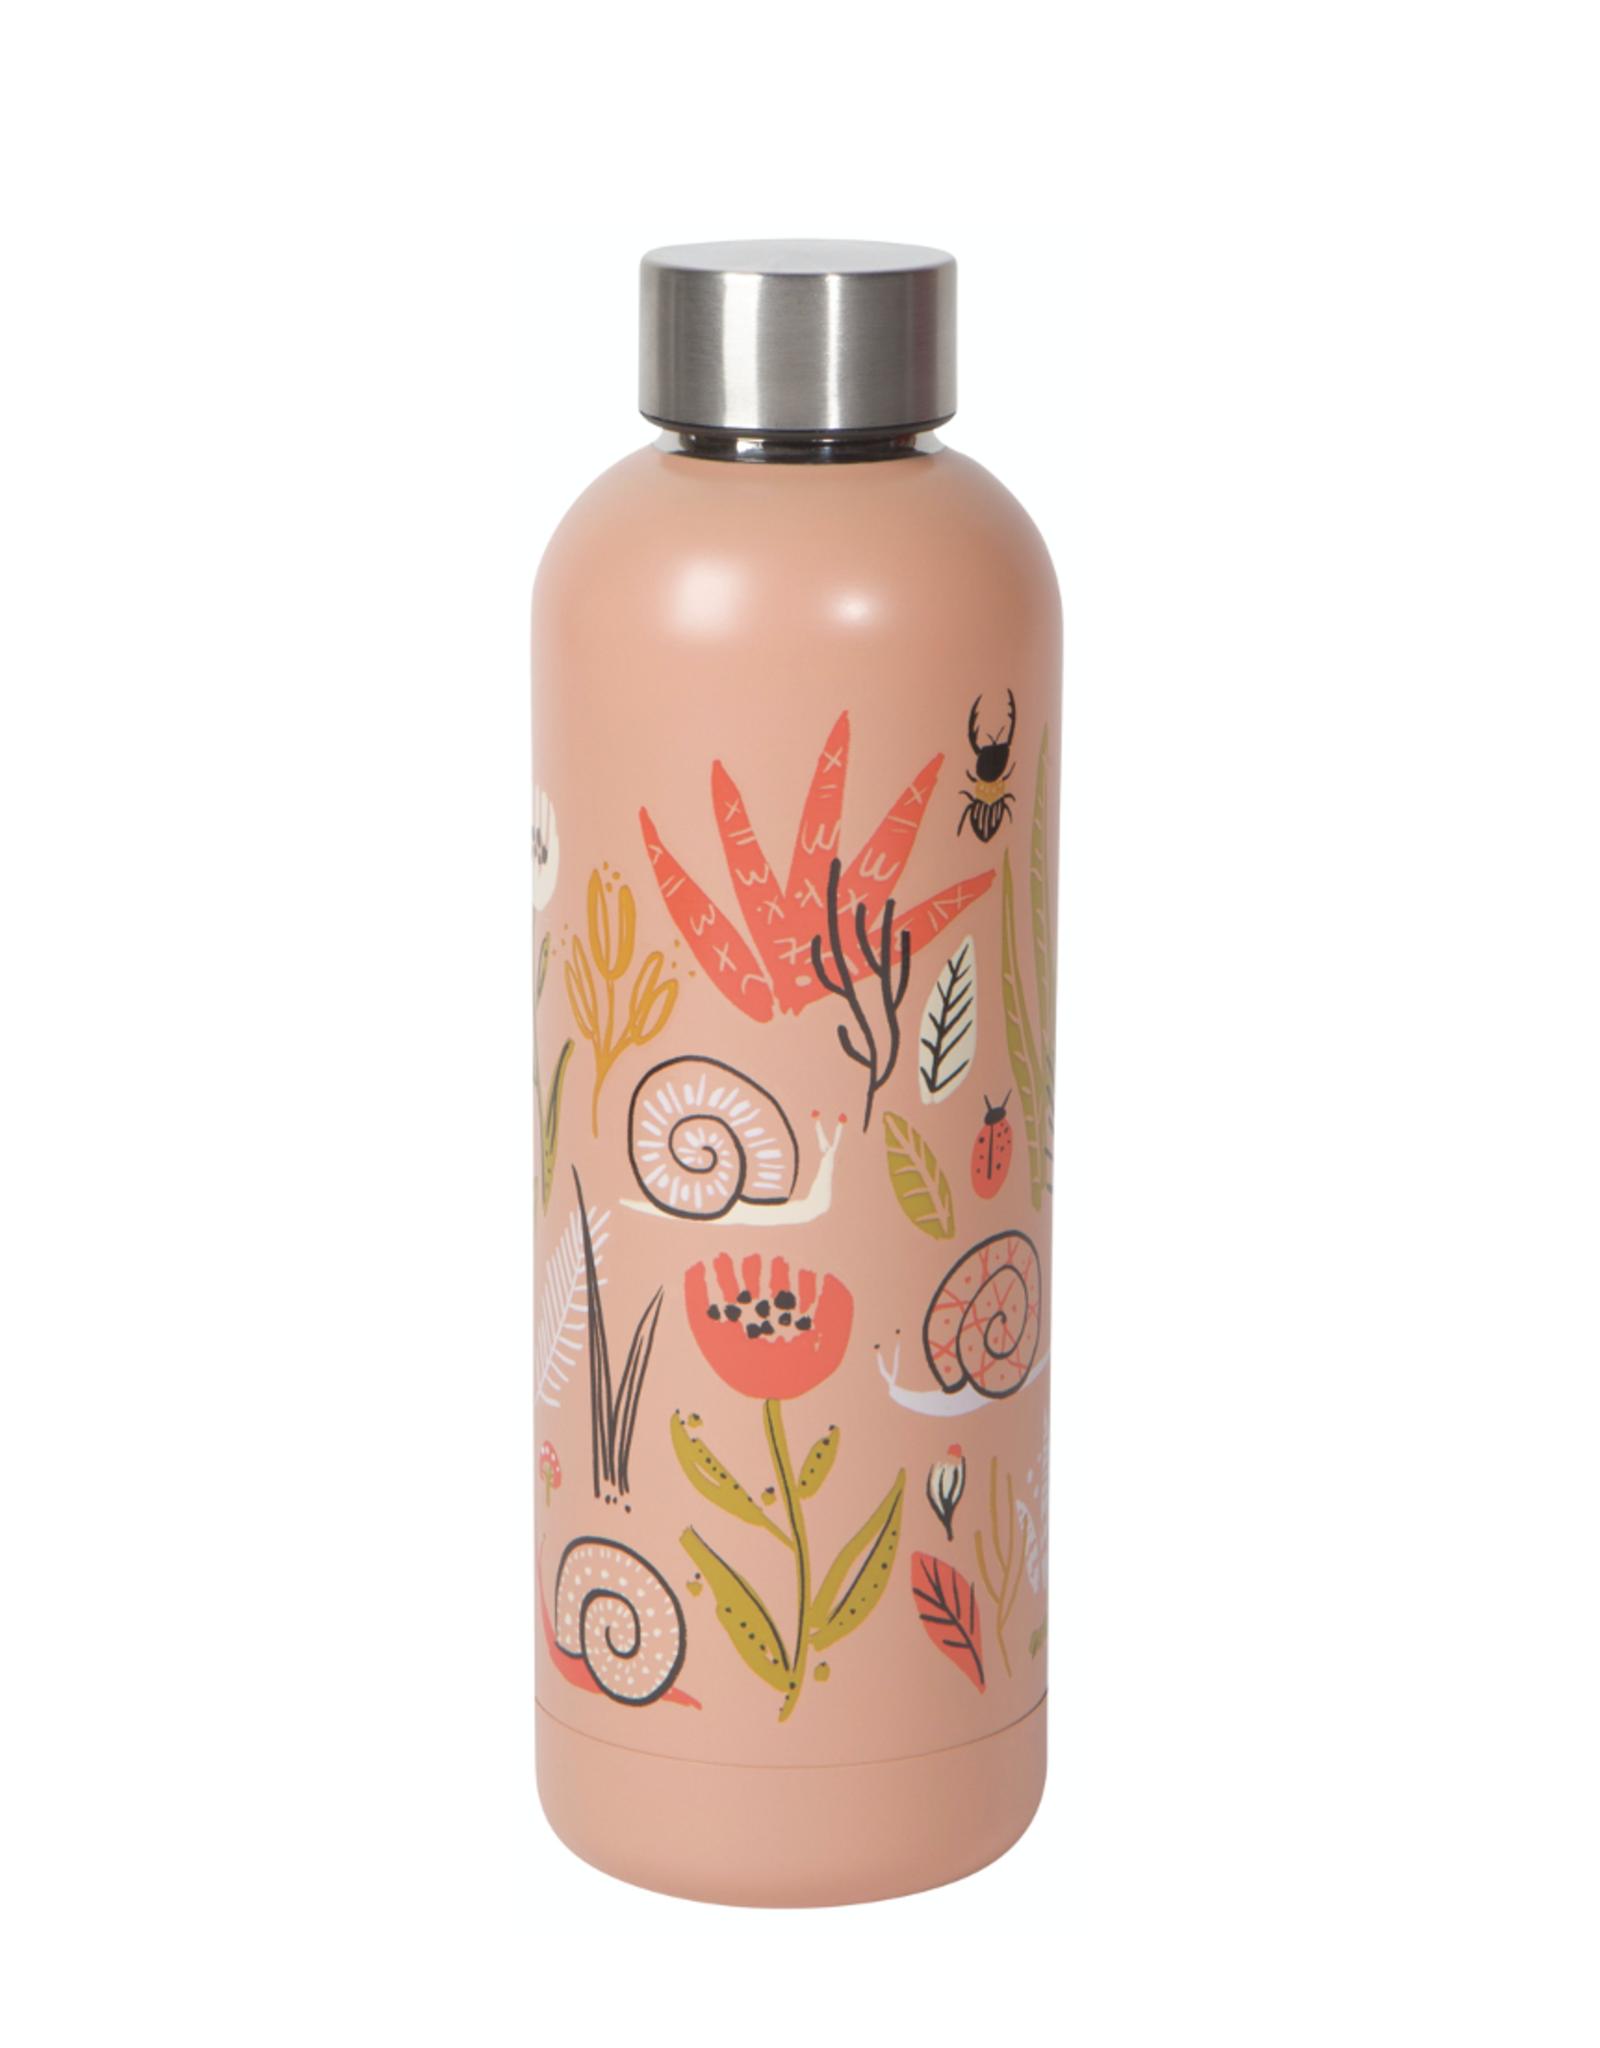 Danica Danica - Small World Water Bottle